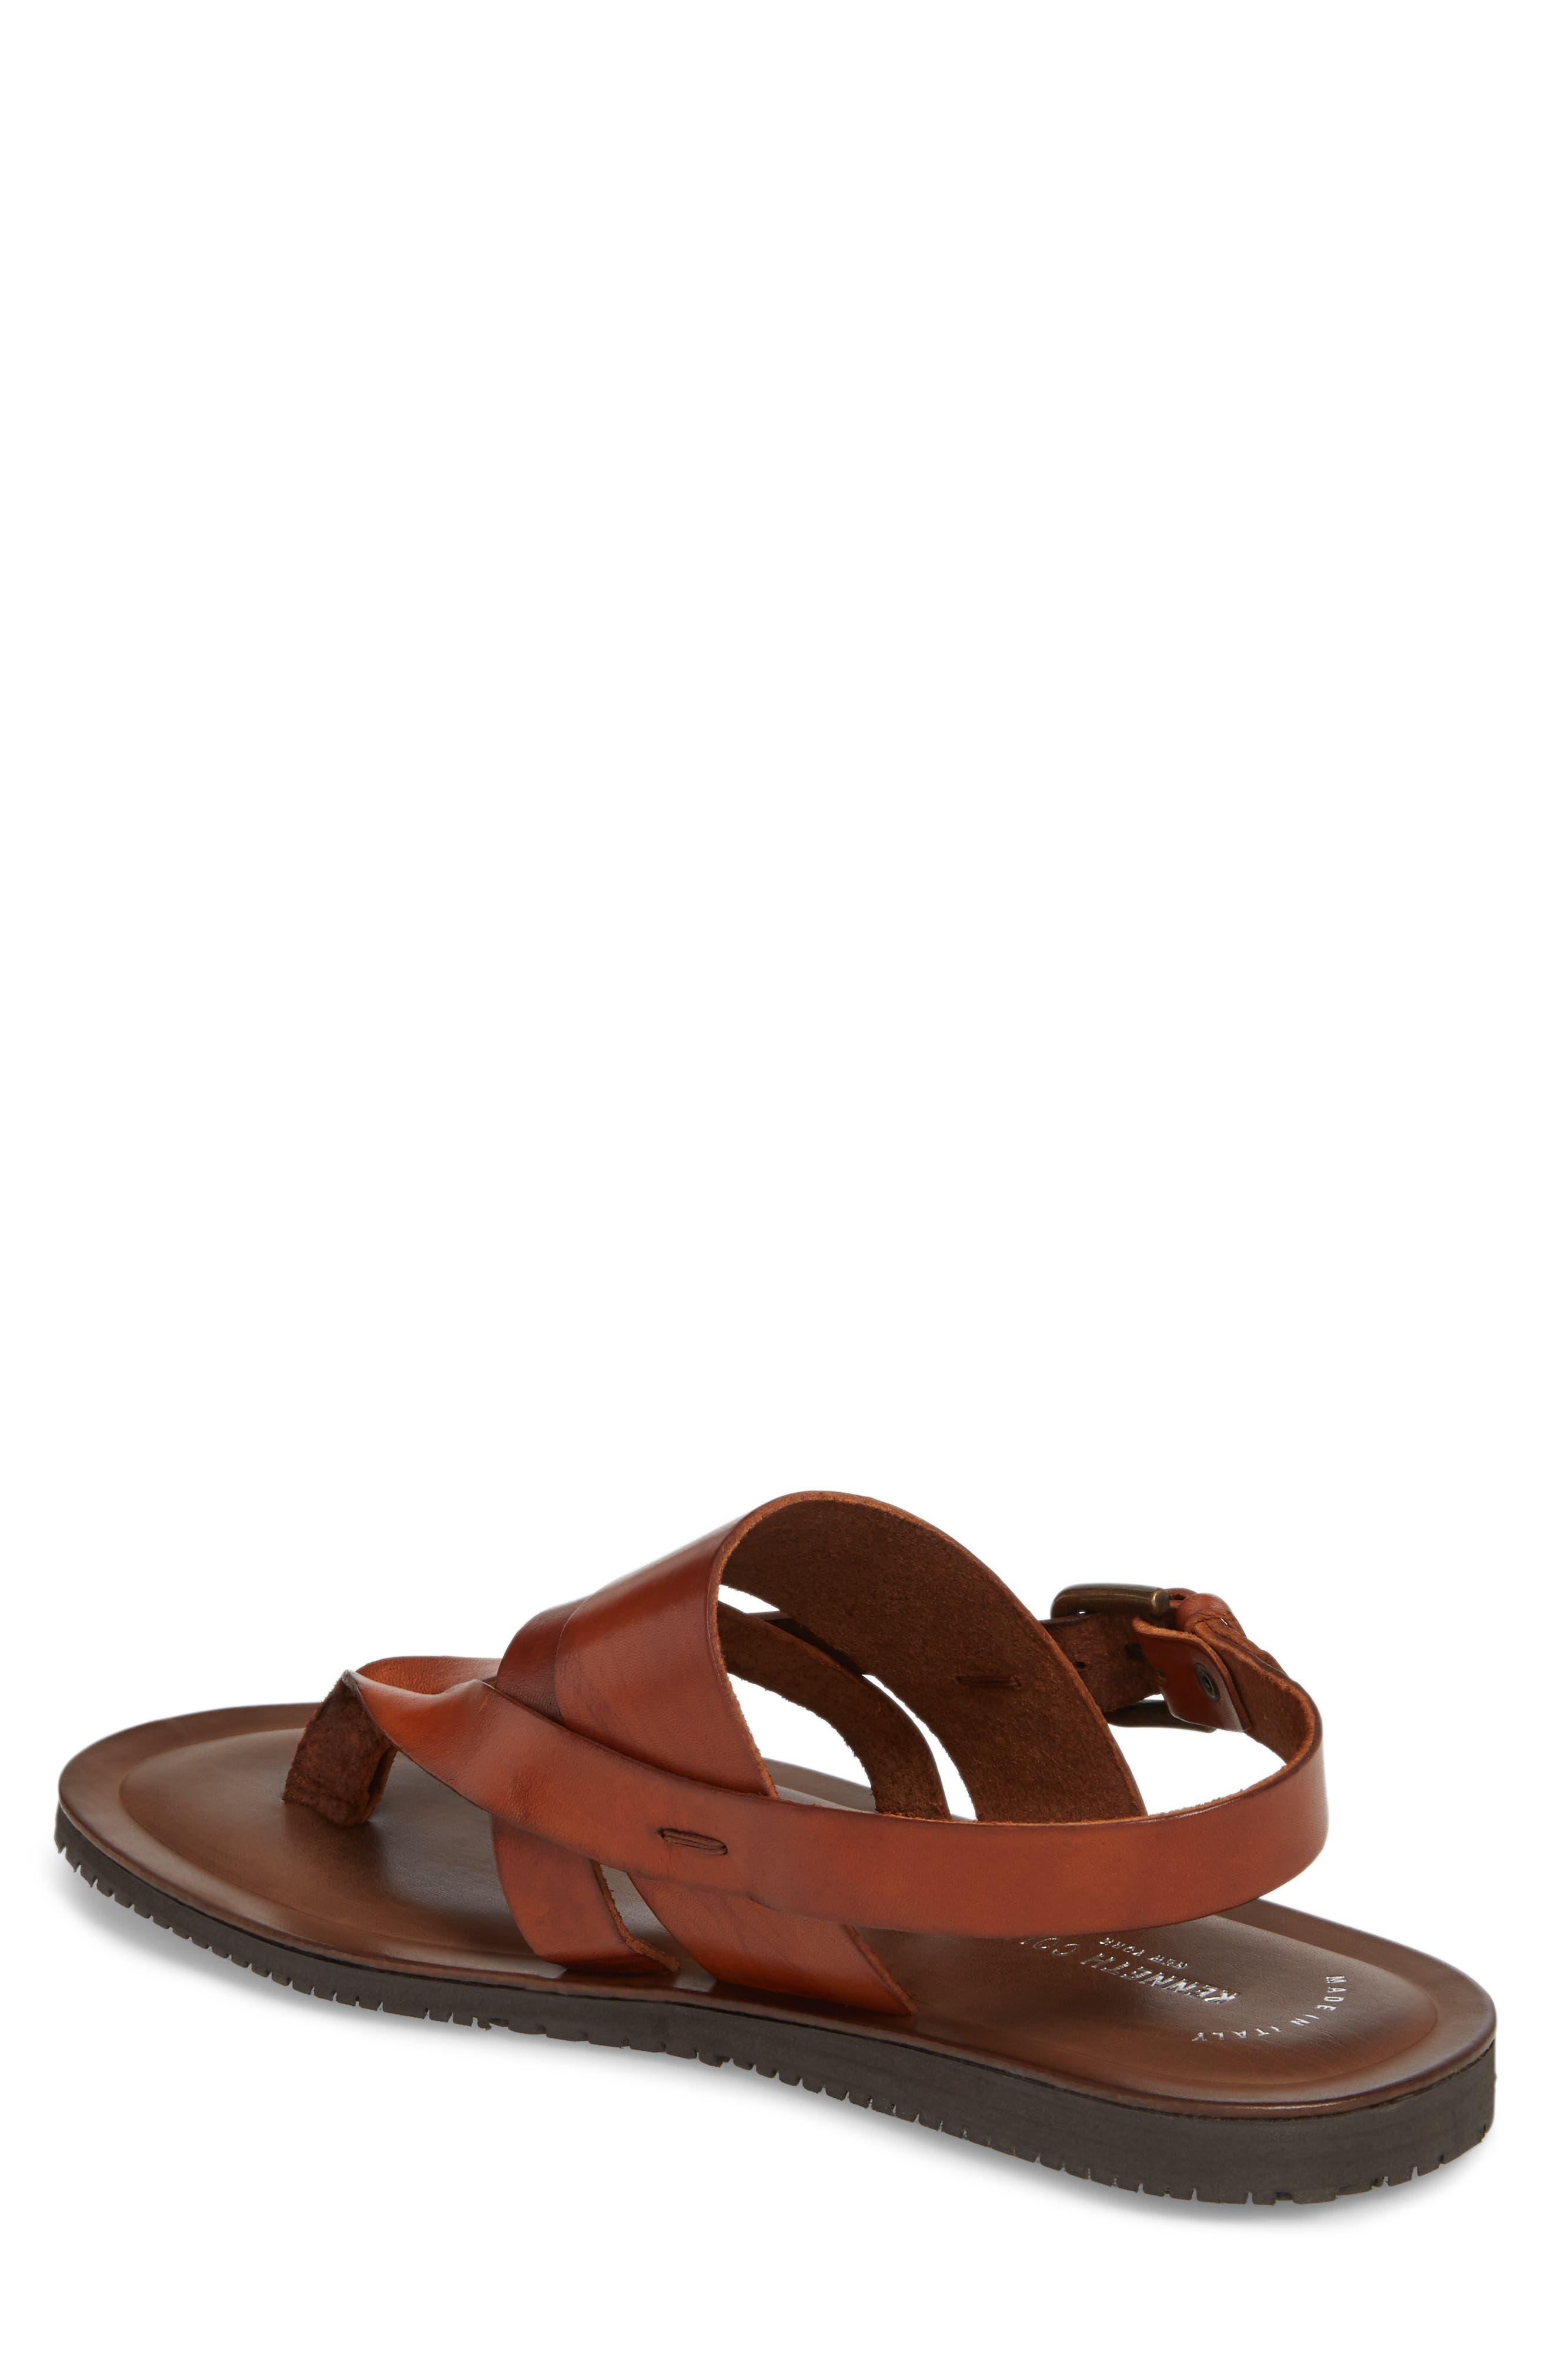 'Reel-Ist' Sandal,                             Alternate thumbnail 2, color,                             Cognac Leather